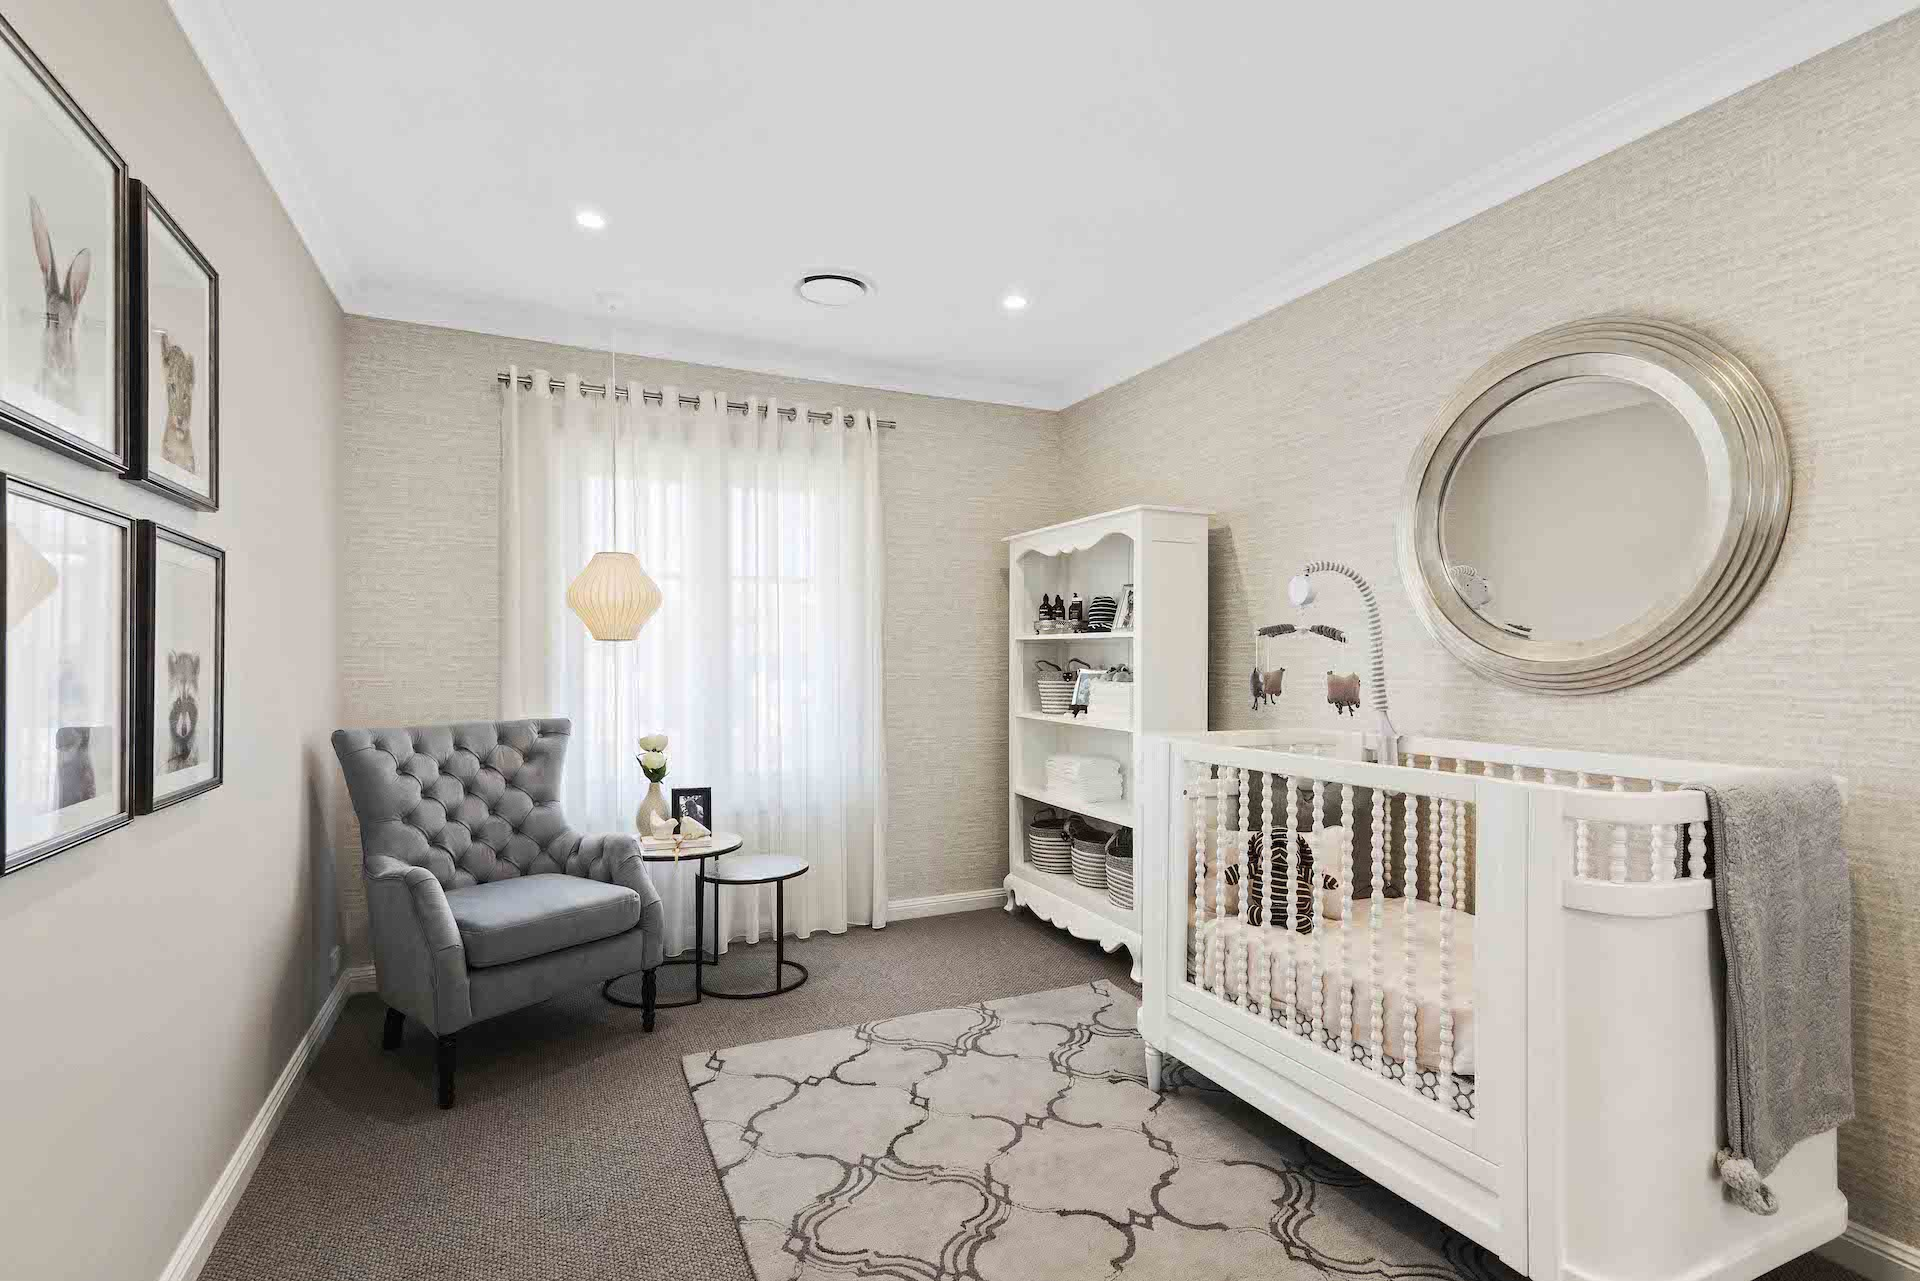 gender neutral nursery design white white baby furniture and grey tufted armchair in corner